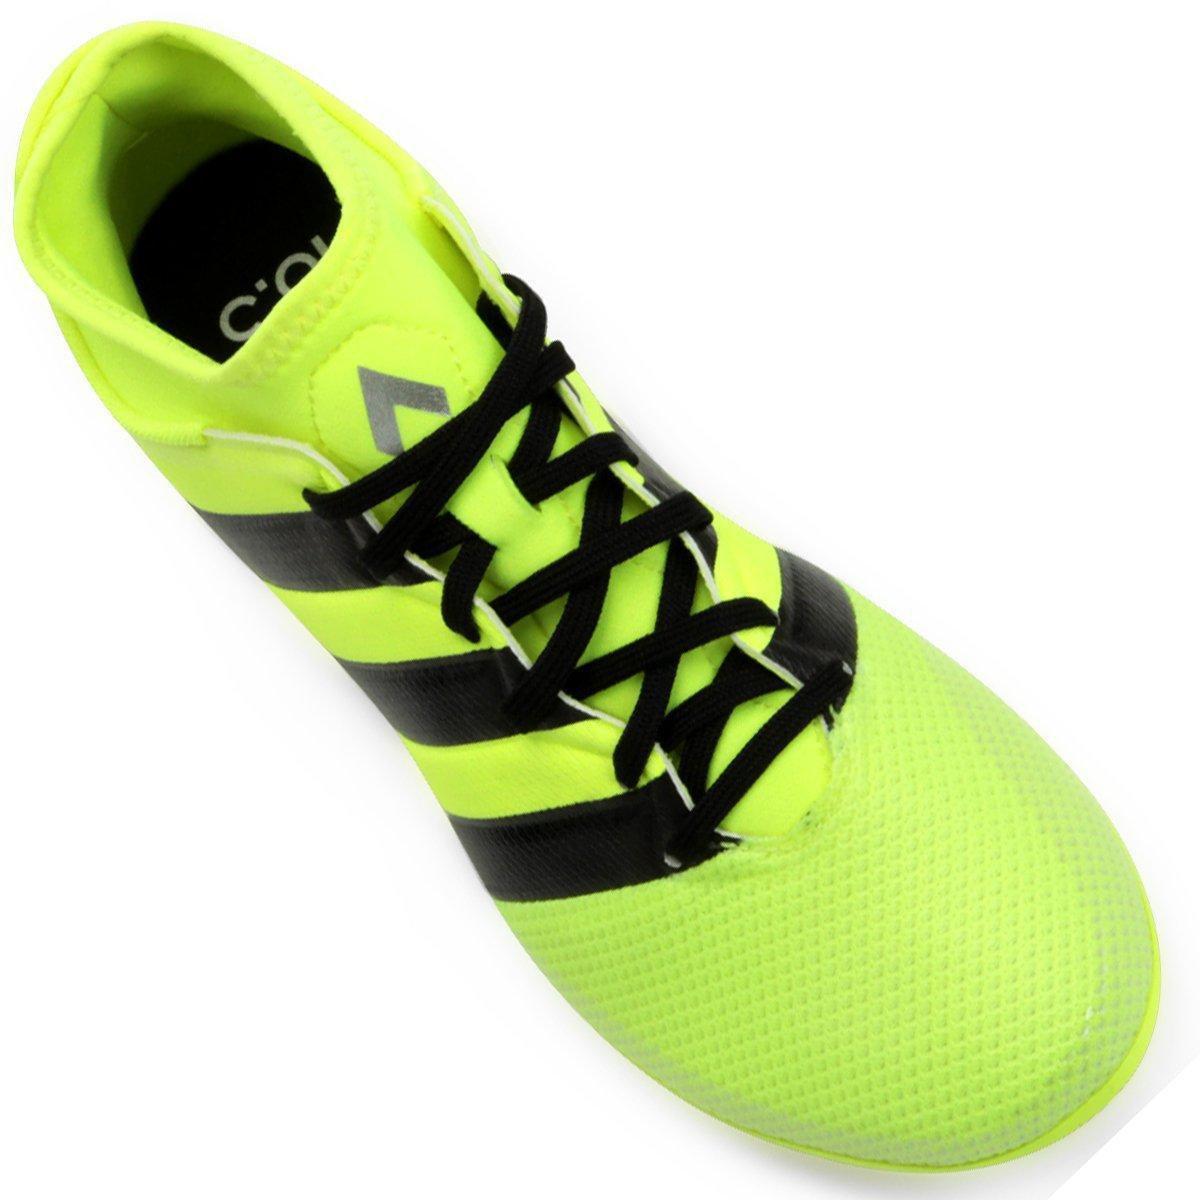 5b3f1d883dcb7 ... Chuteira Adidas Ace 16.3 Primemesh FG Campo. Chuteira Adidas Ace 16.3  Primemesh FG Campo - Verde Limão+Preto